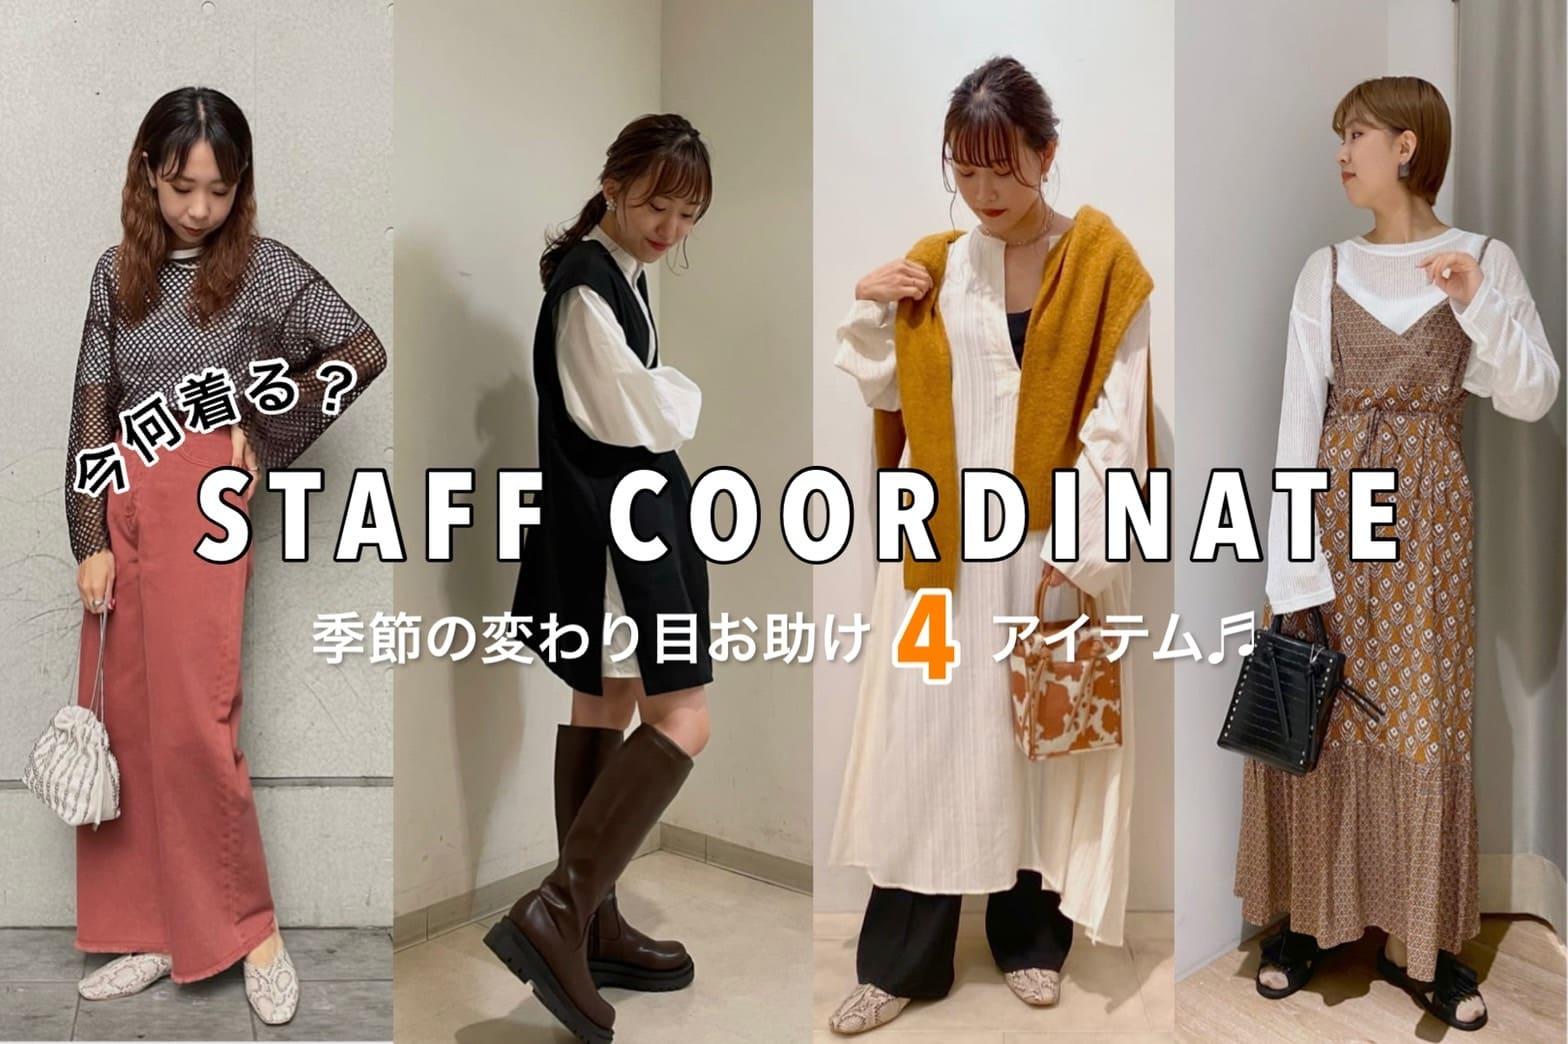 Discoat 【STAFF COORDINATE】季節の変わり目お助け4アイテム♪